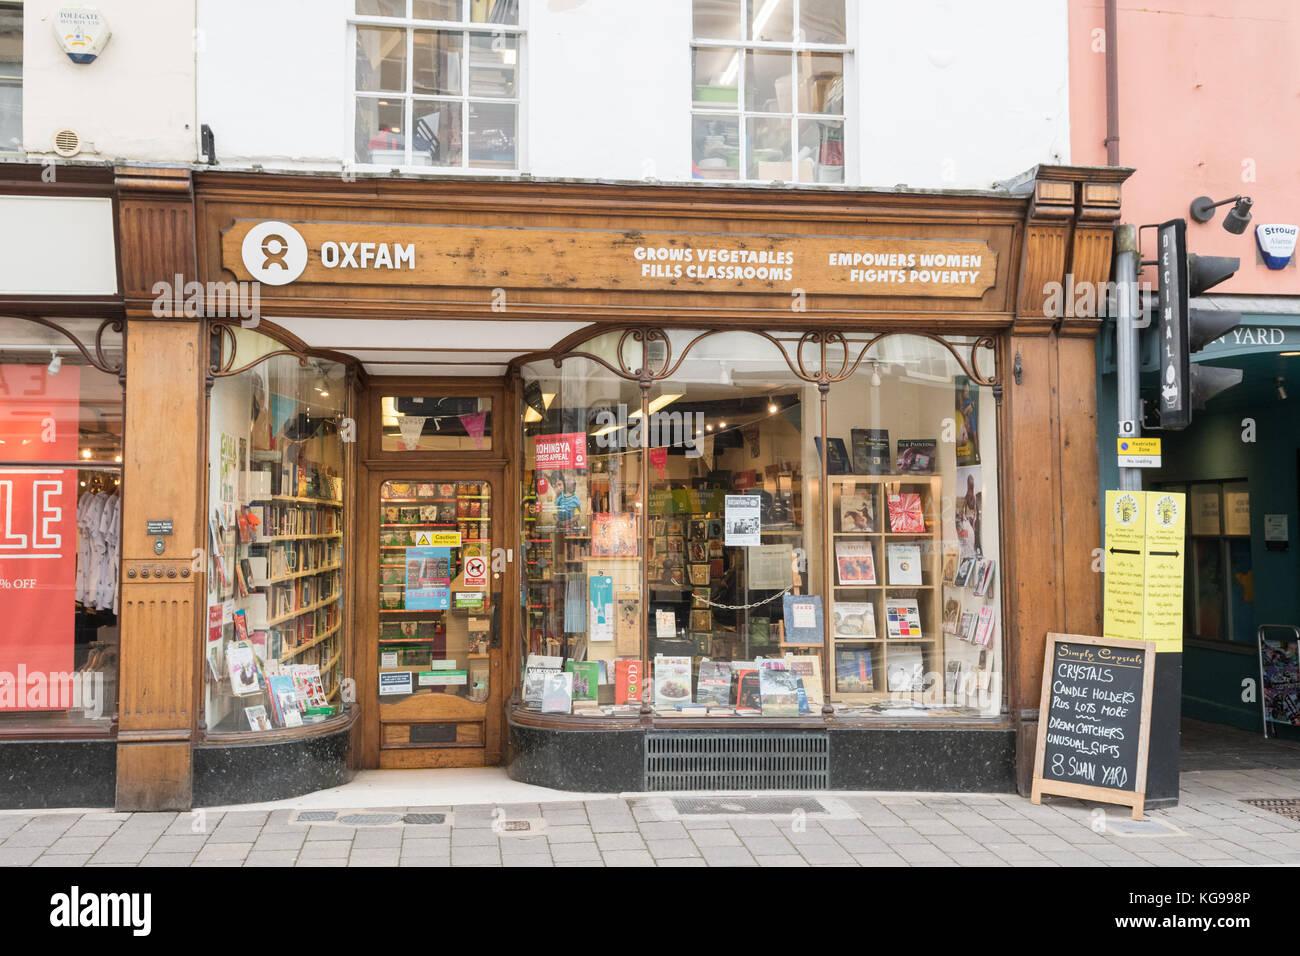 Oxfam shop with unusual signage Cirencester, England, UK - Stock Image